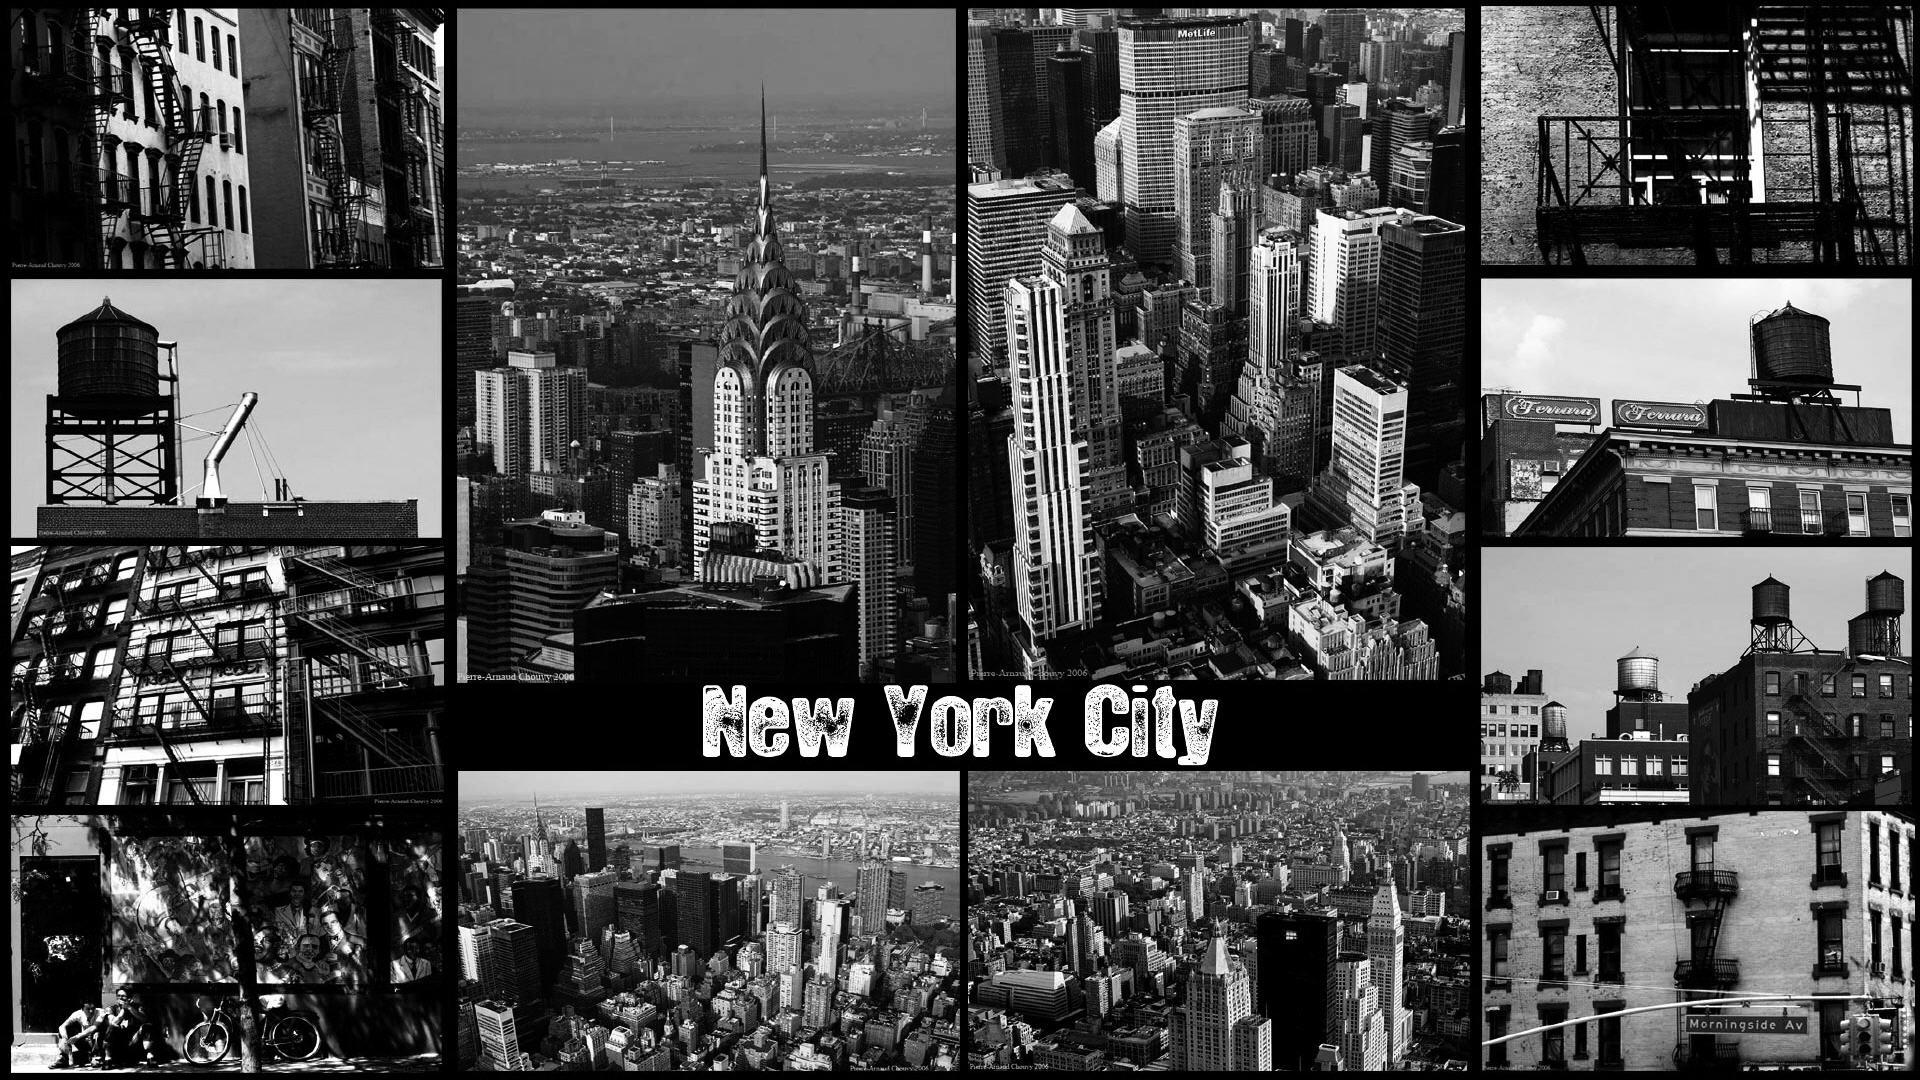 City Guide New York Wallpaper HD 1920x1080 4016 1920x1080